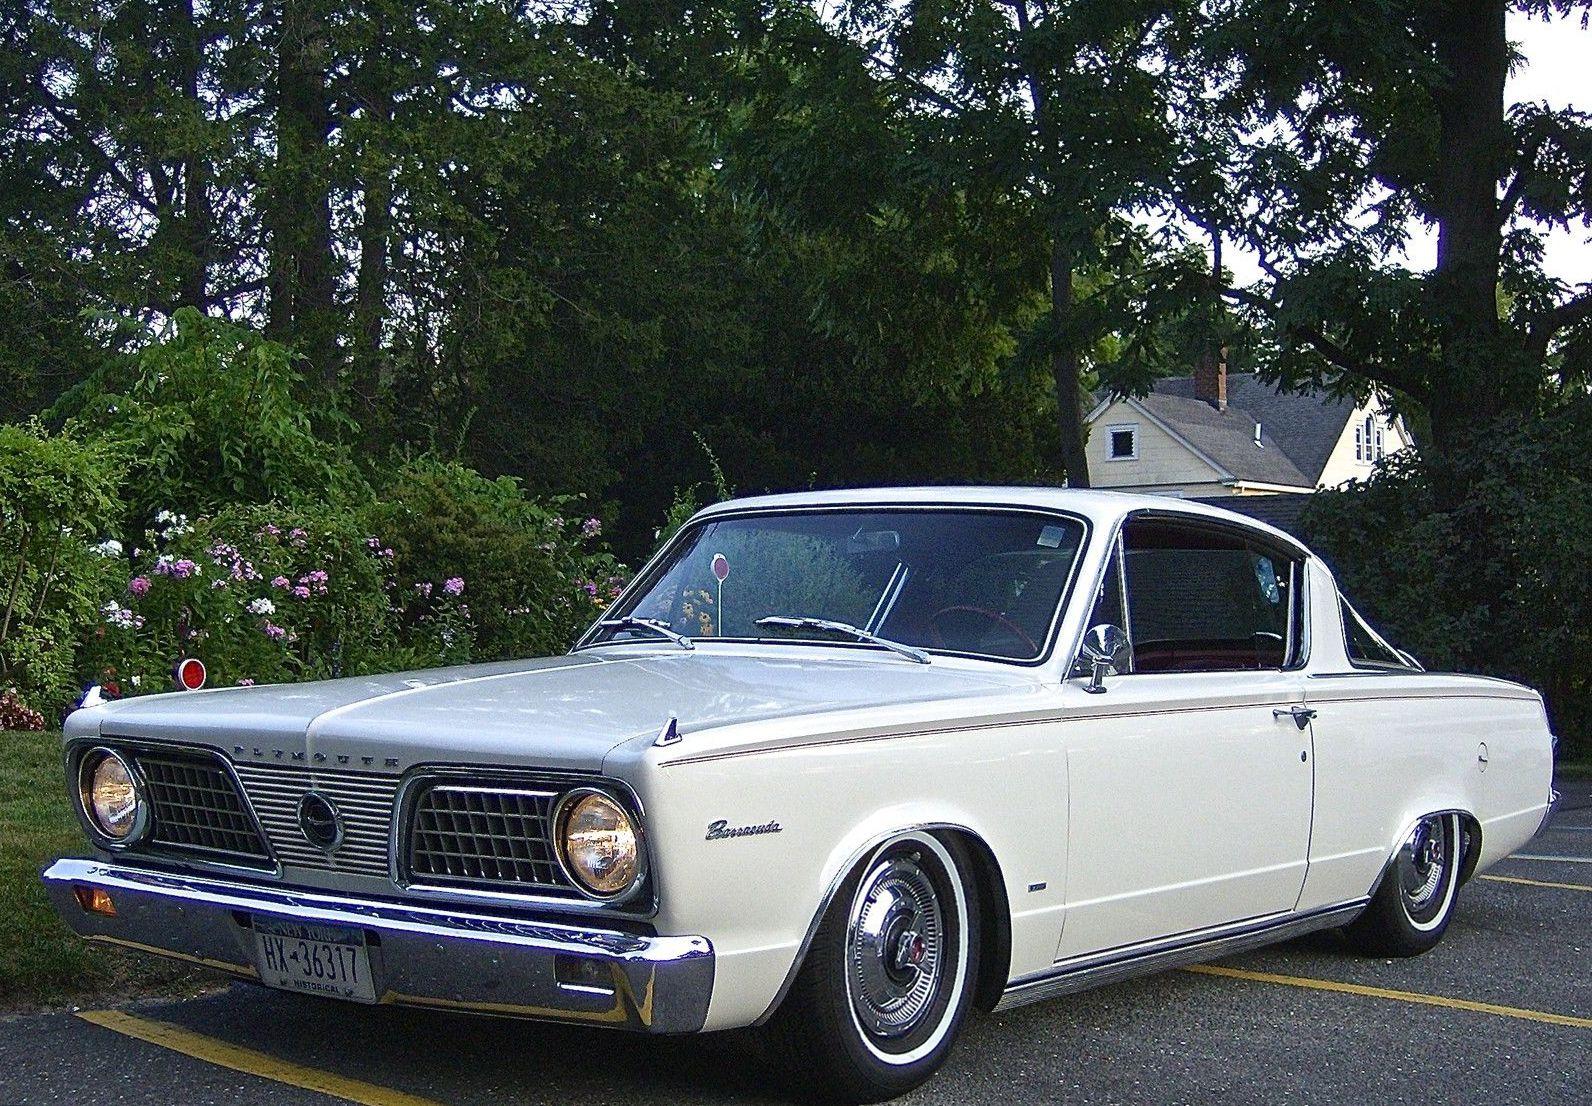 1966 Plymouth Barracuda Fastback Commando V8 | Welcome to